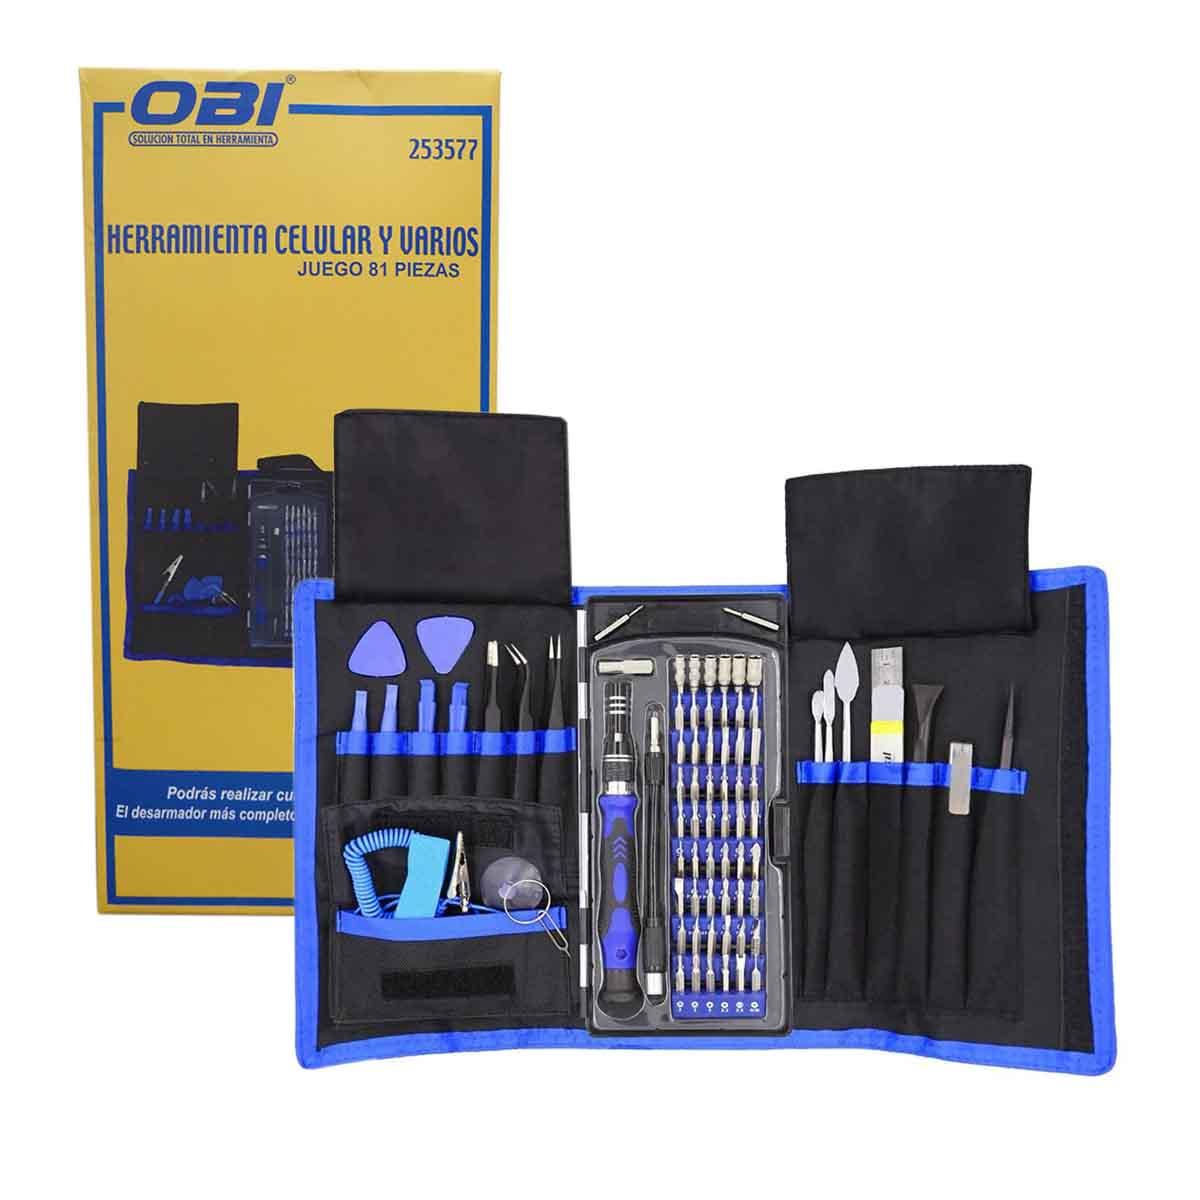 Kit Desarmador Herramienta Reparacion Celular 81 en 1 OBI